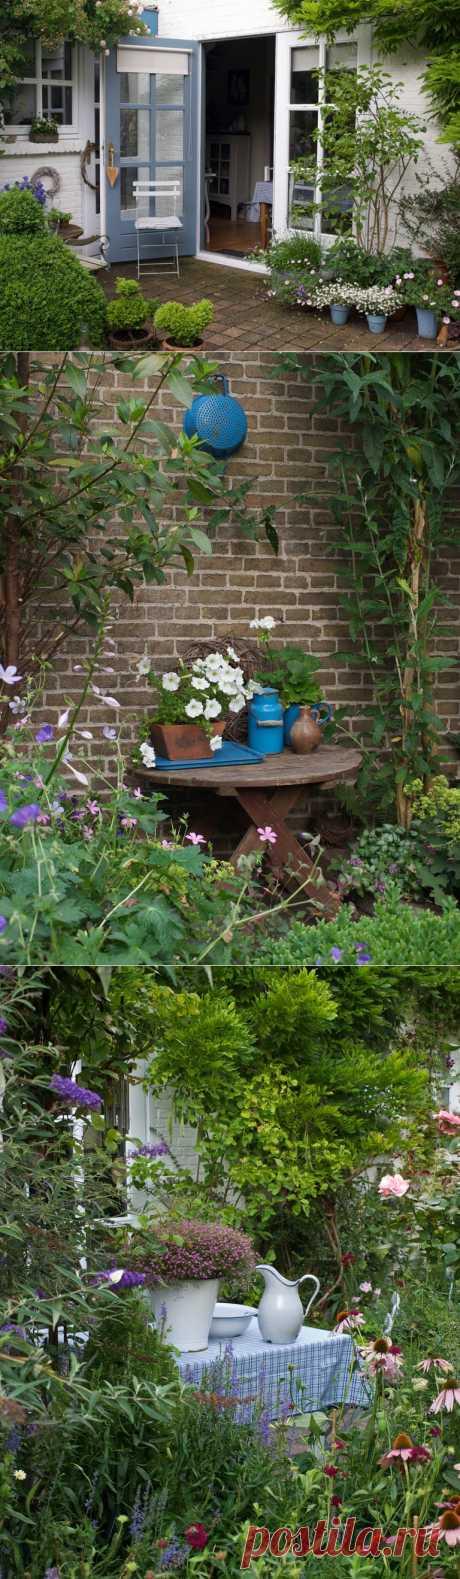 Сад и дом. Идеи для дачи.